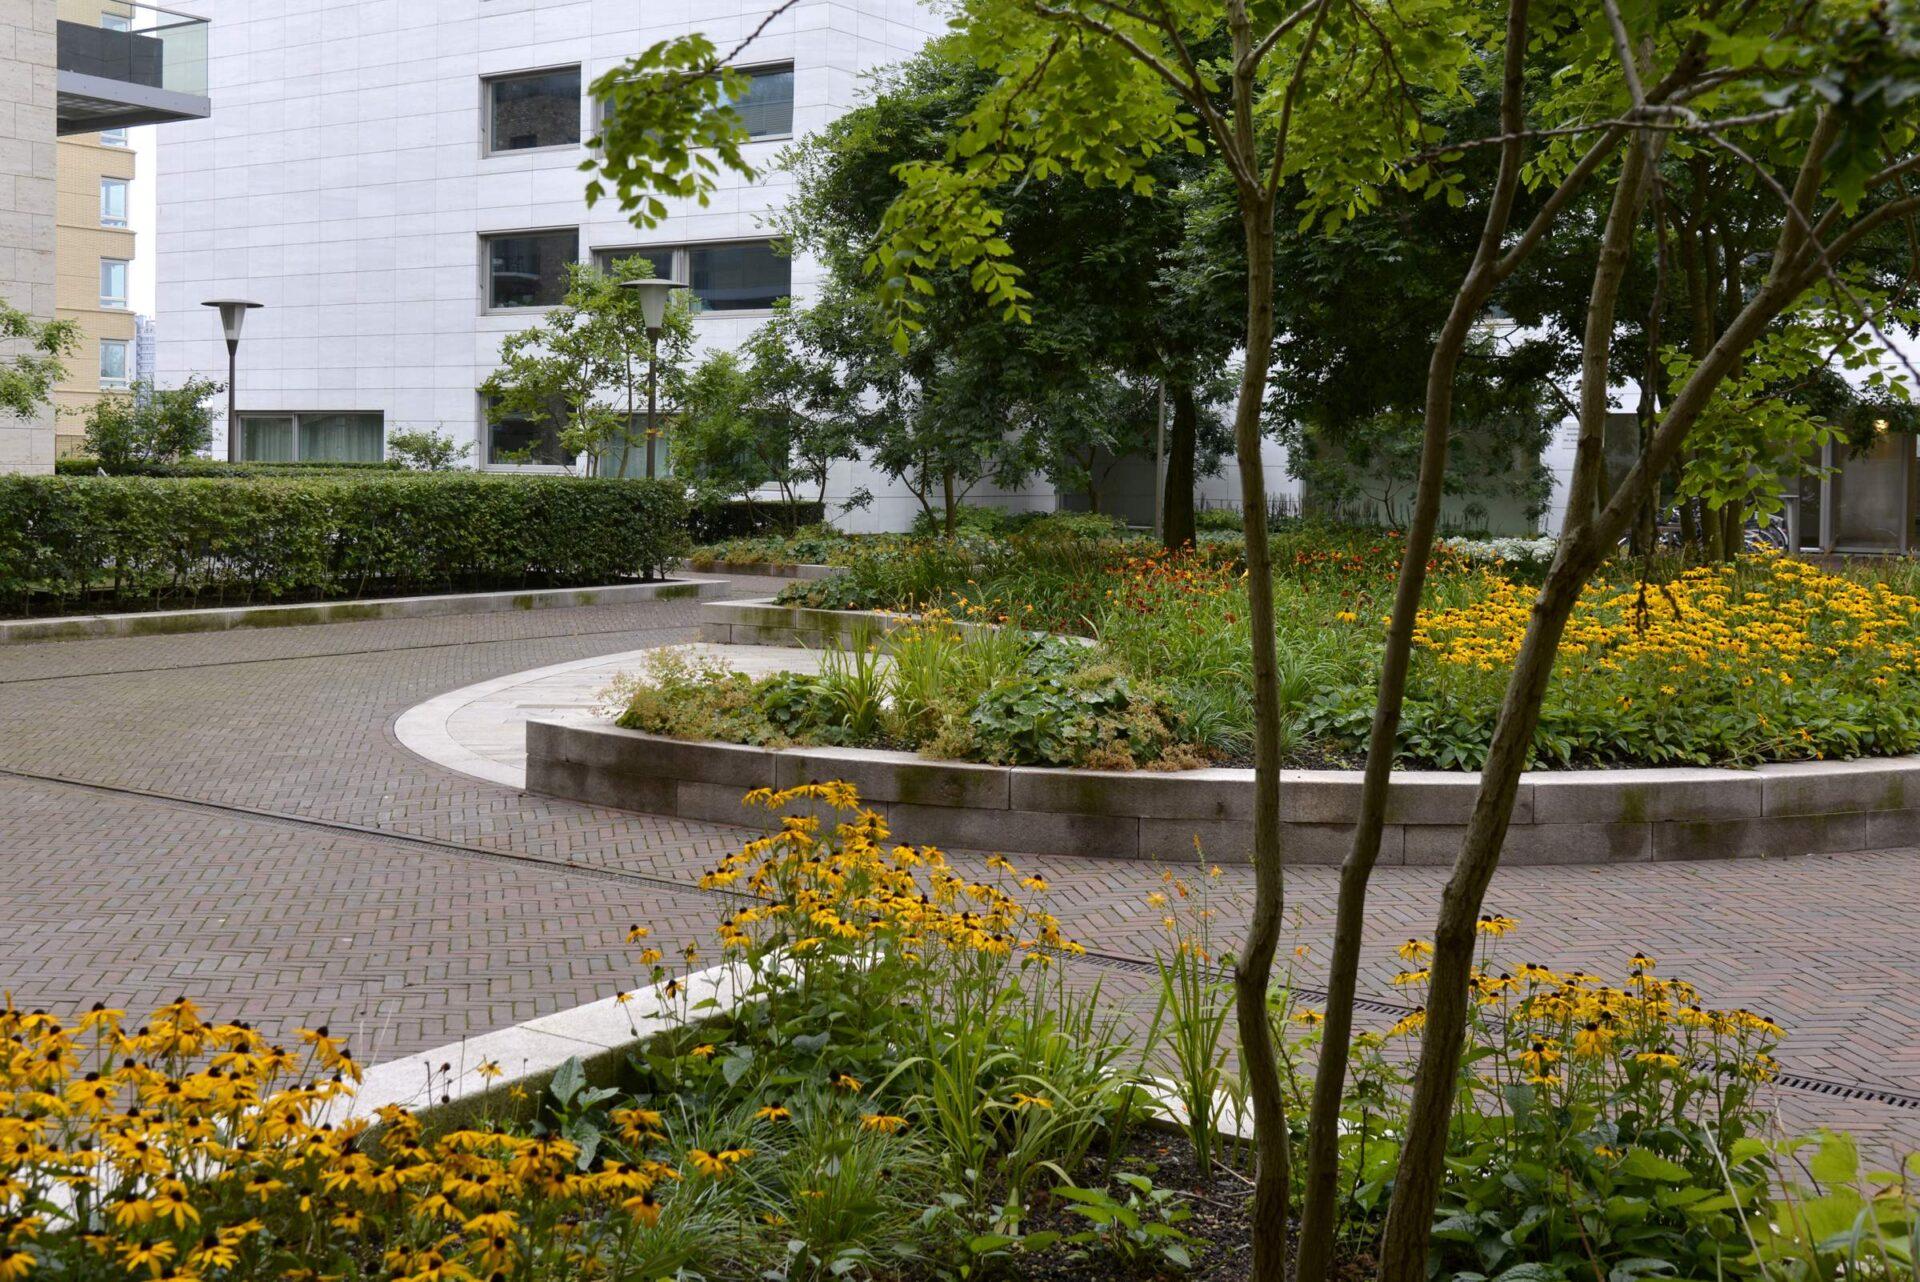 LANDLAB OEVERHOEK courtyard garden yellow_0